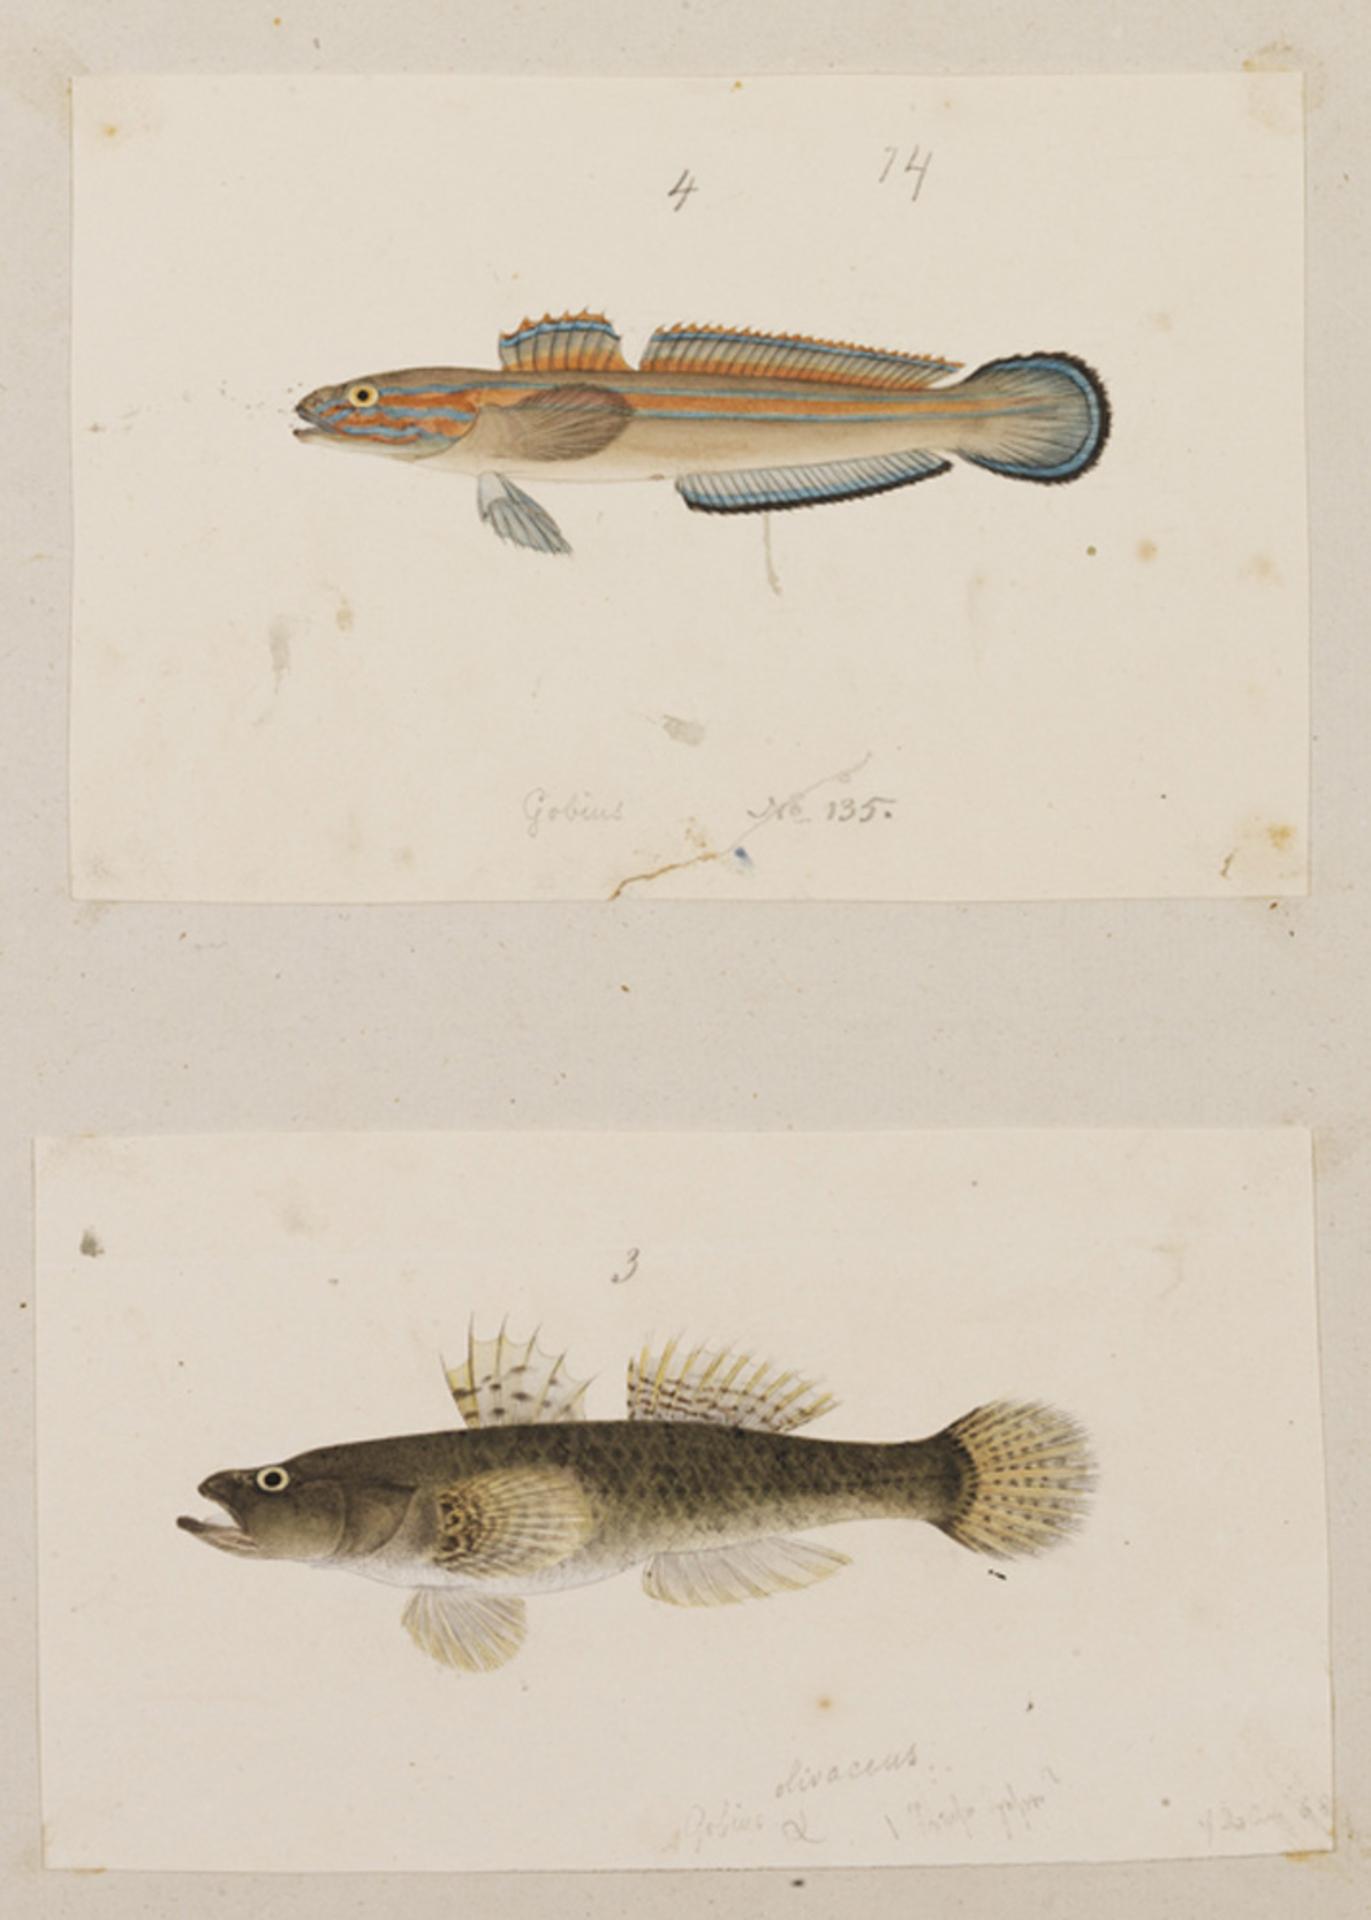 RMNH.ART.201 | Glossogobius olivaceus